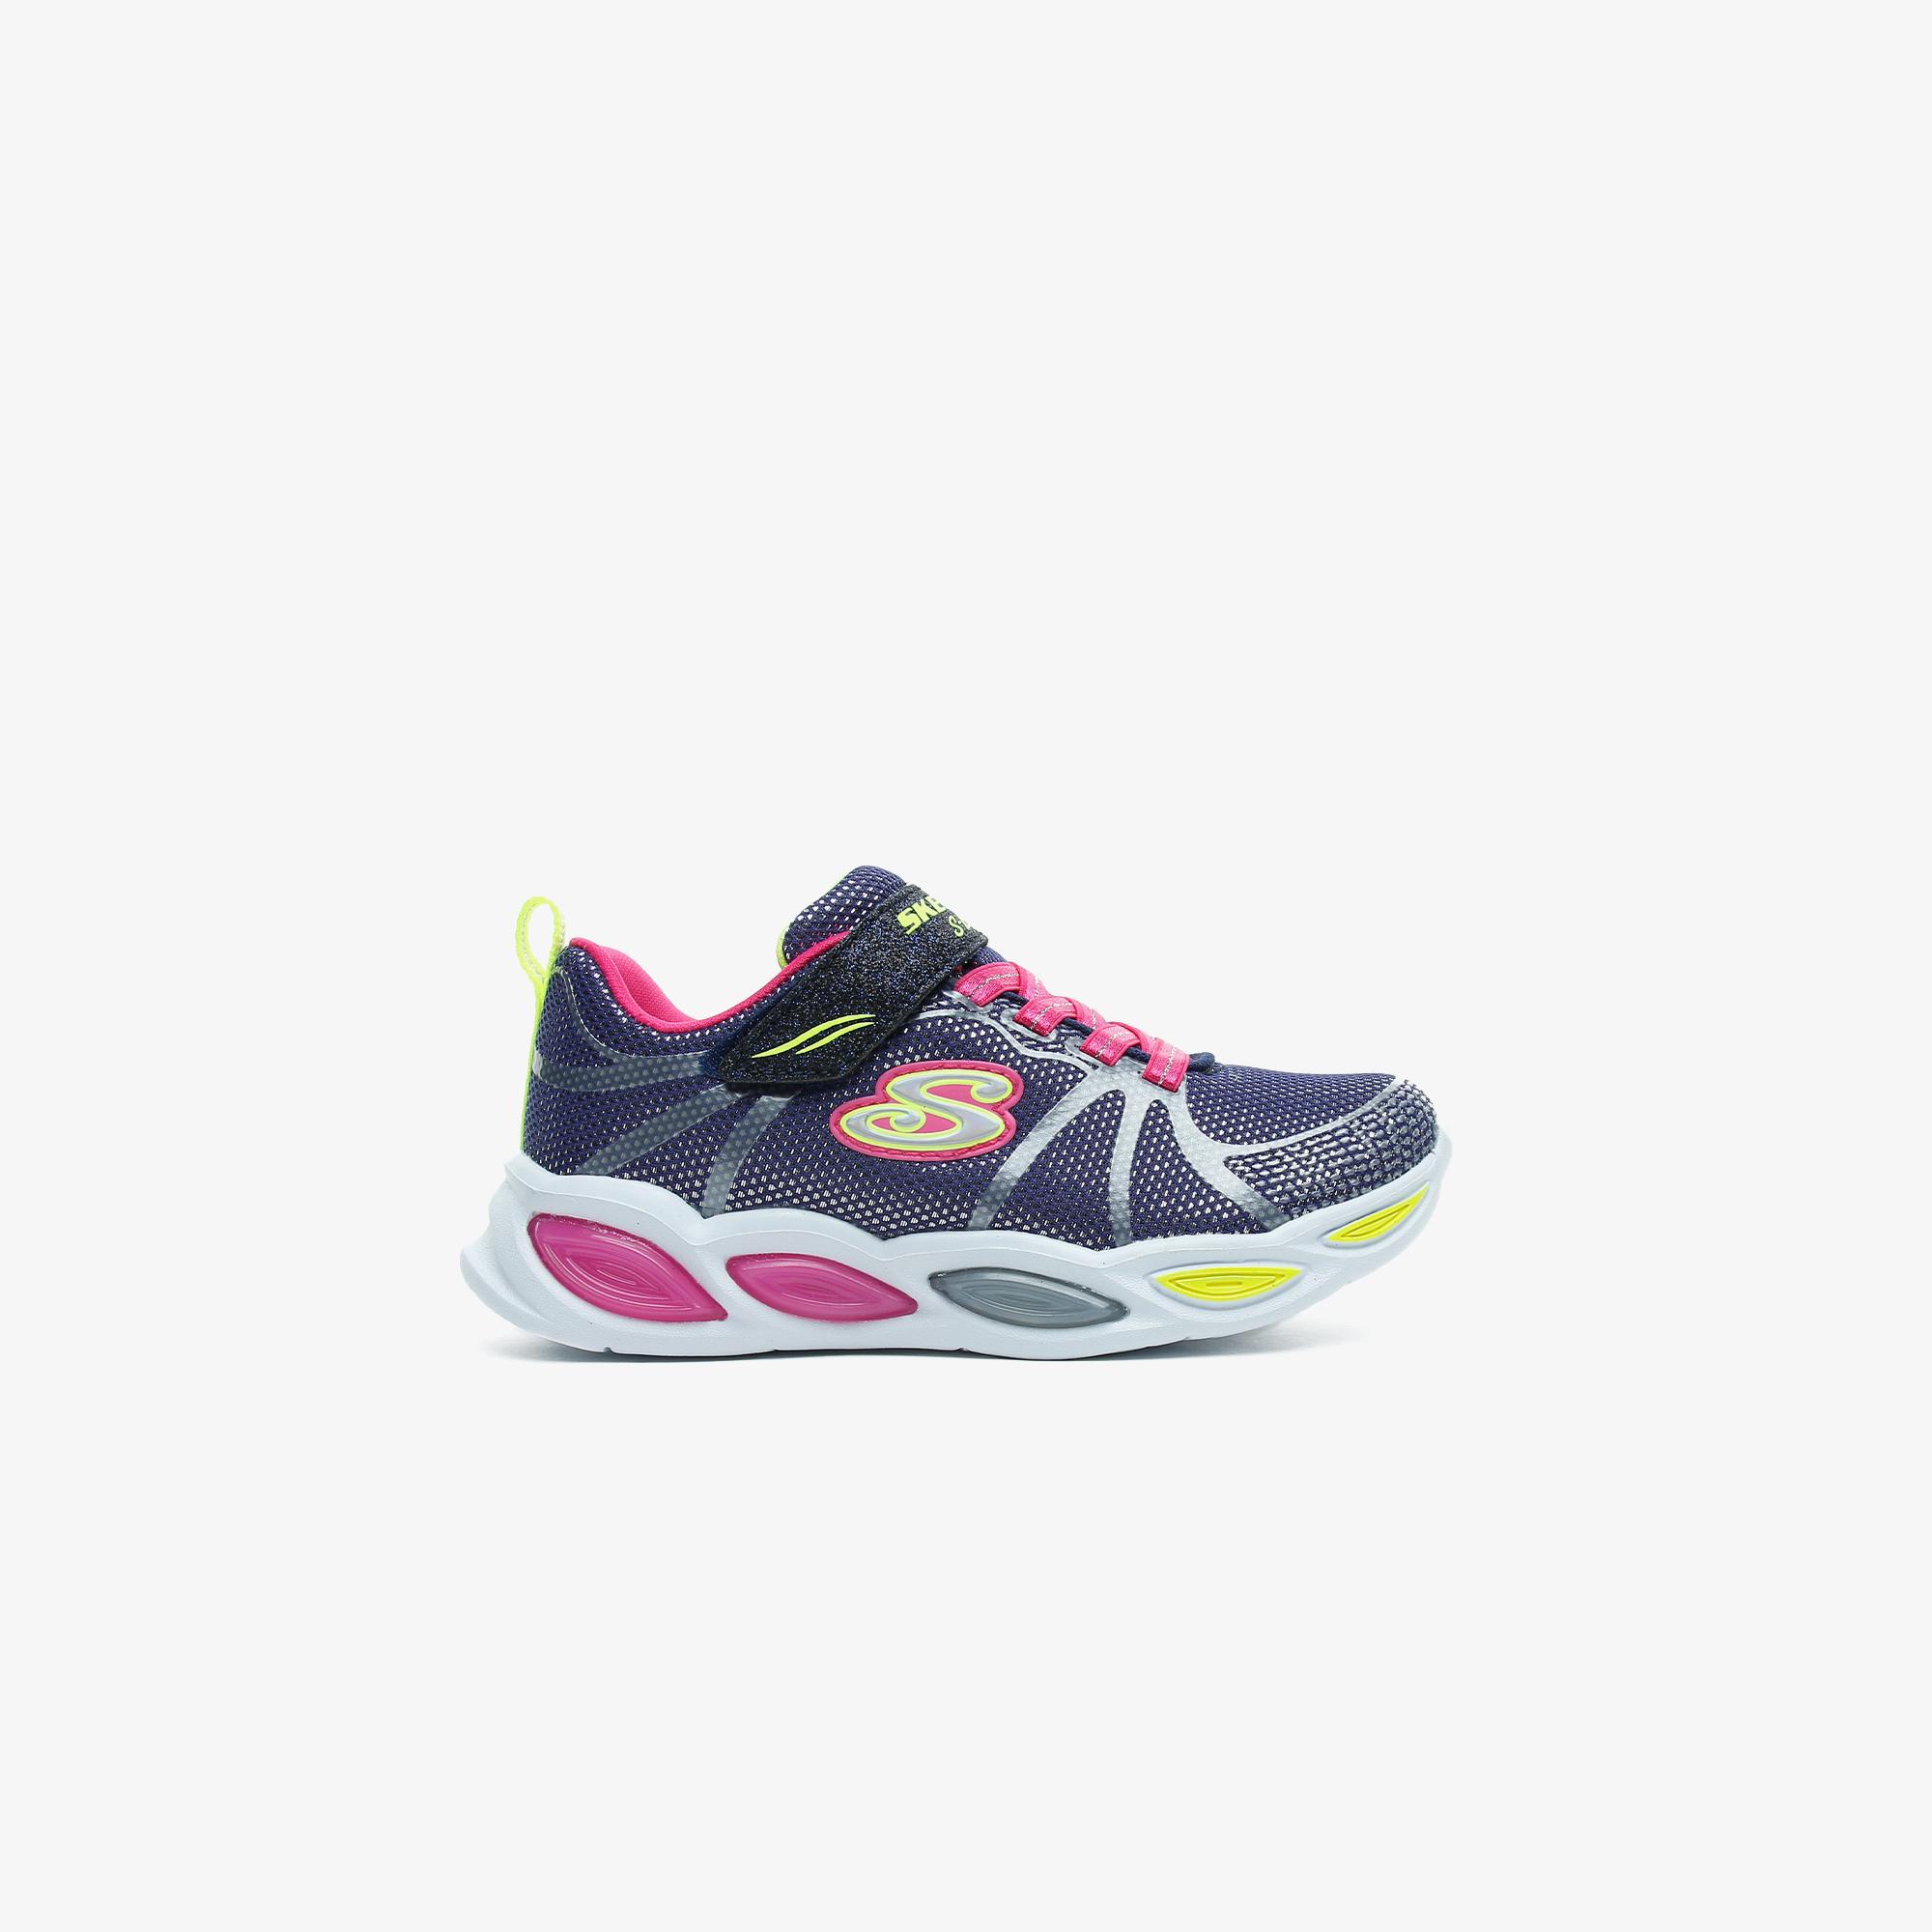 Skechers Shimmer Beams-Sporty Glow Çocuk Lacivert Spor Ayakkabı